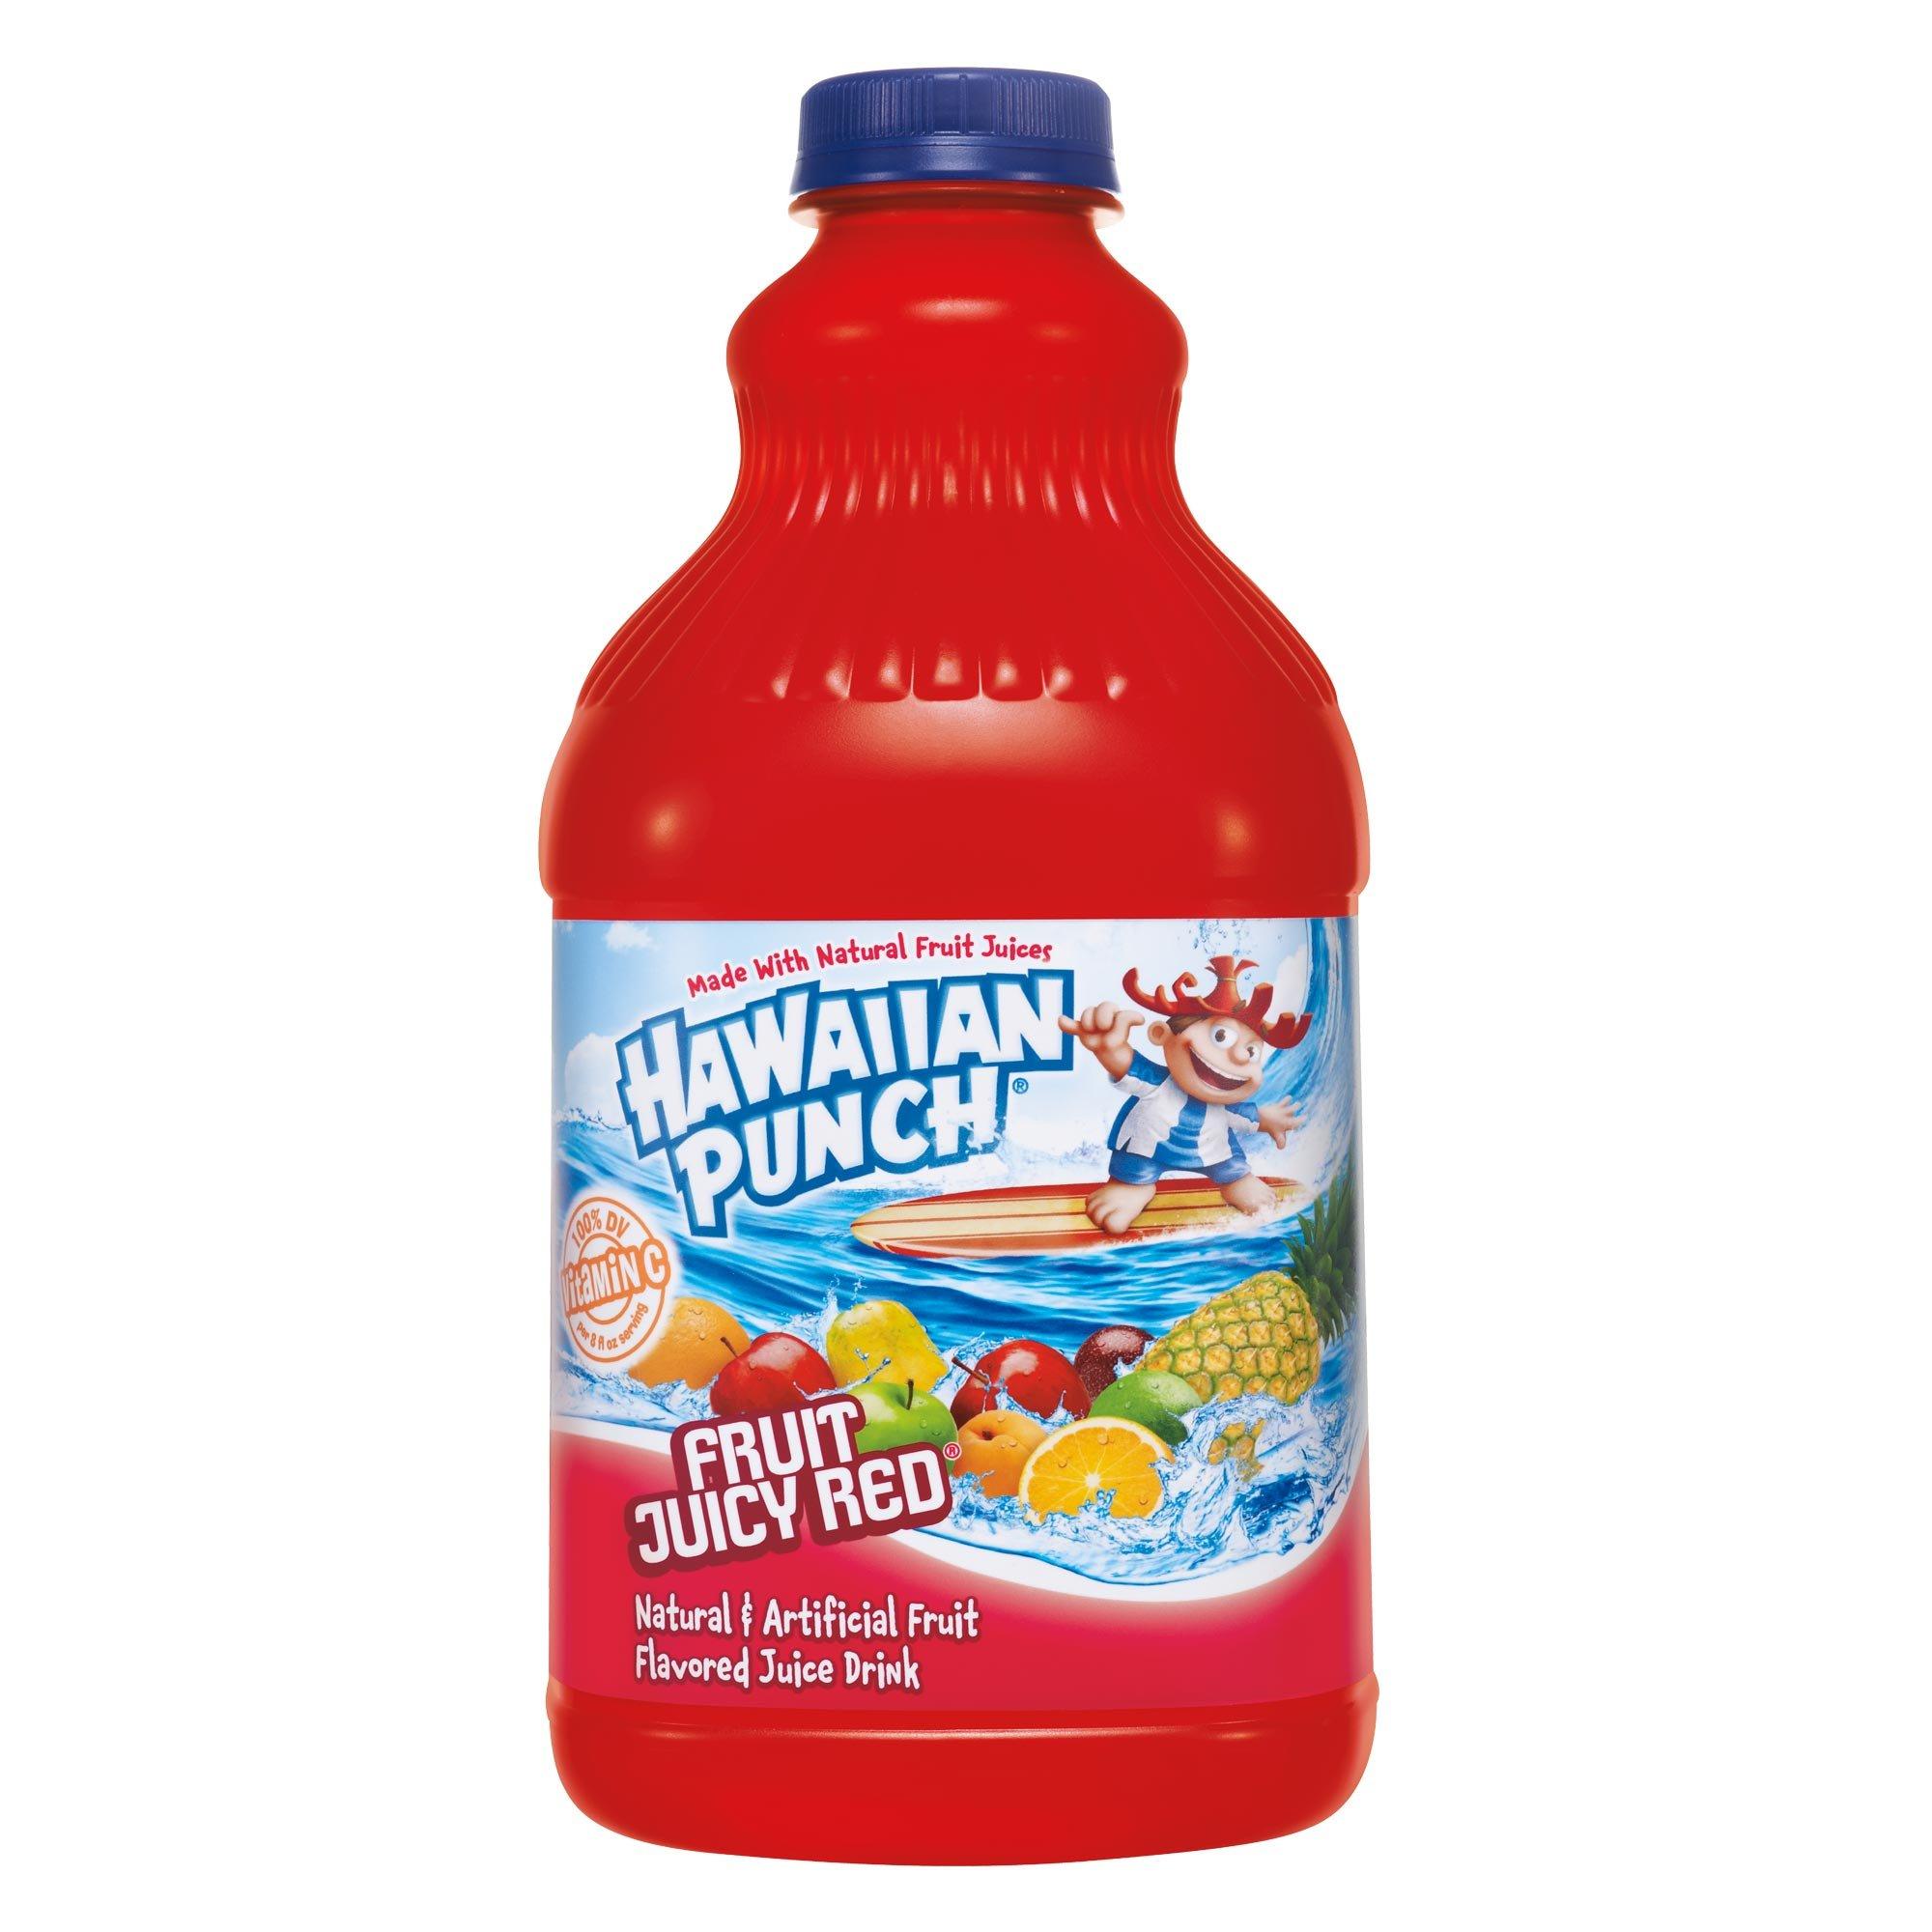 Mott's Hawaiian Punch Fruit Juicy Red, 64-Ounce Bottles (Pack of 8)